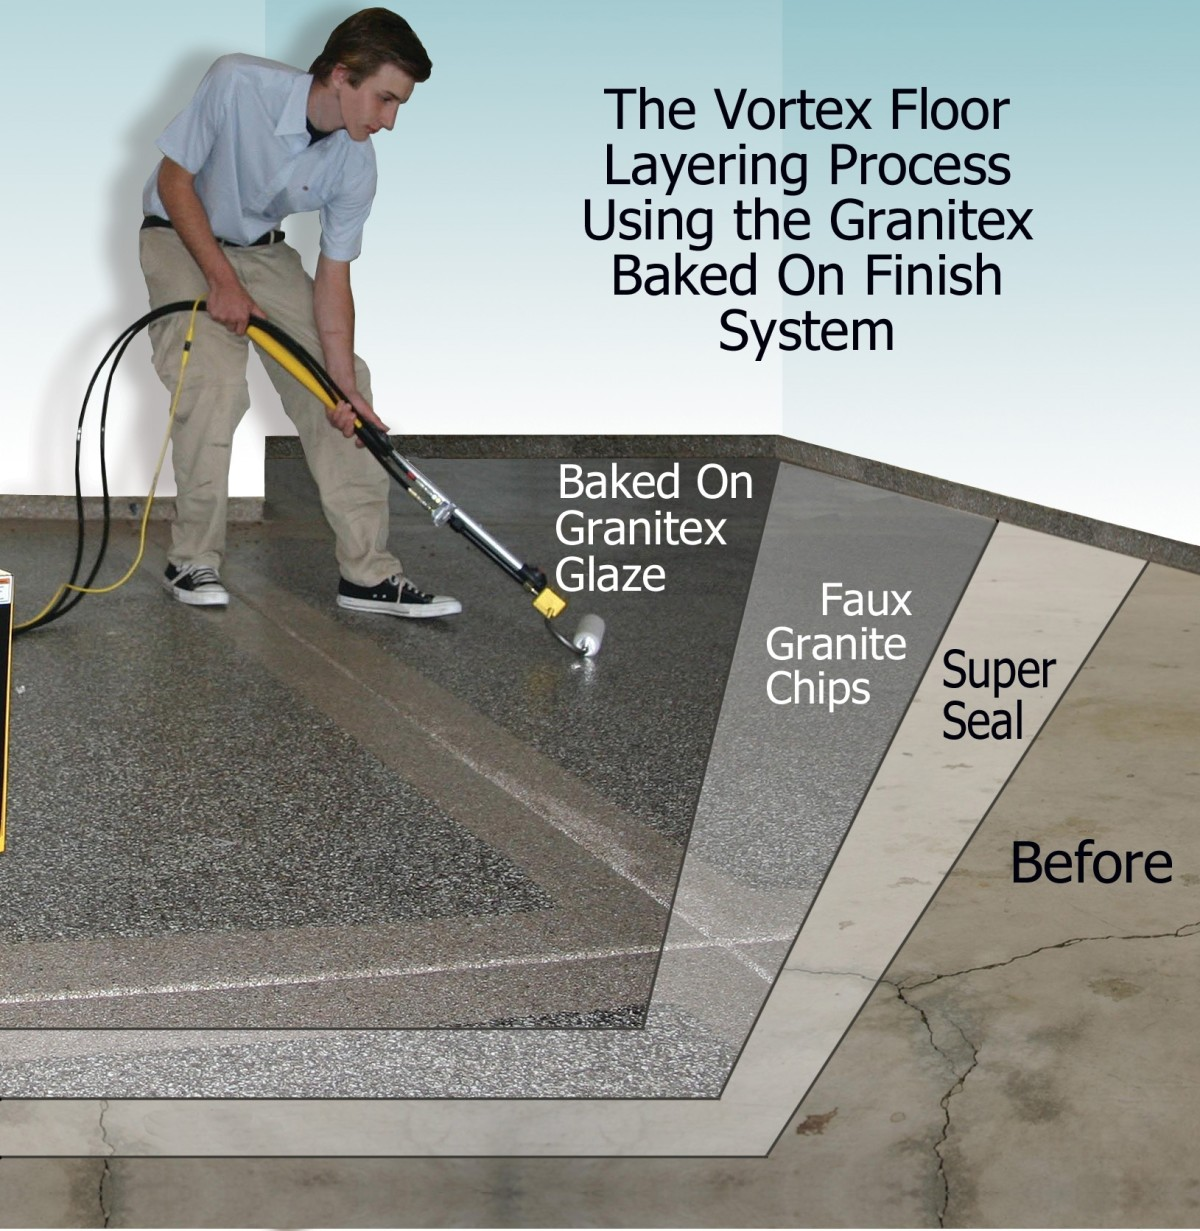 Granitex Layering System